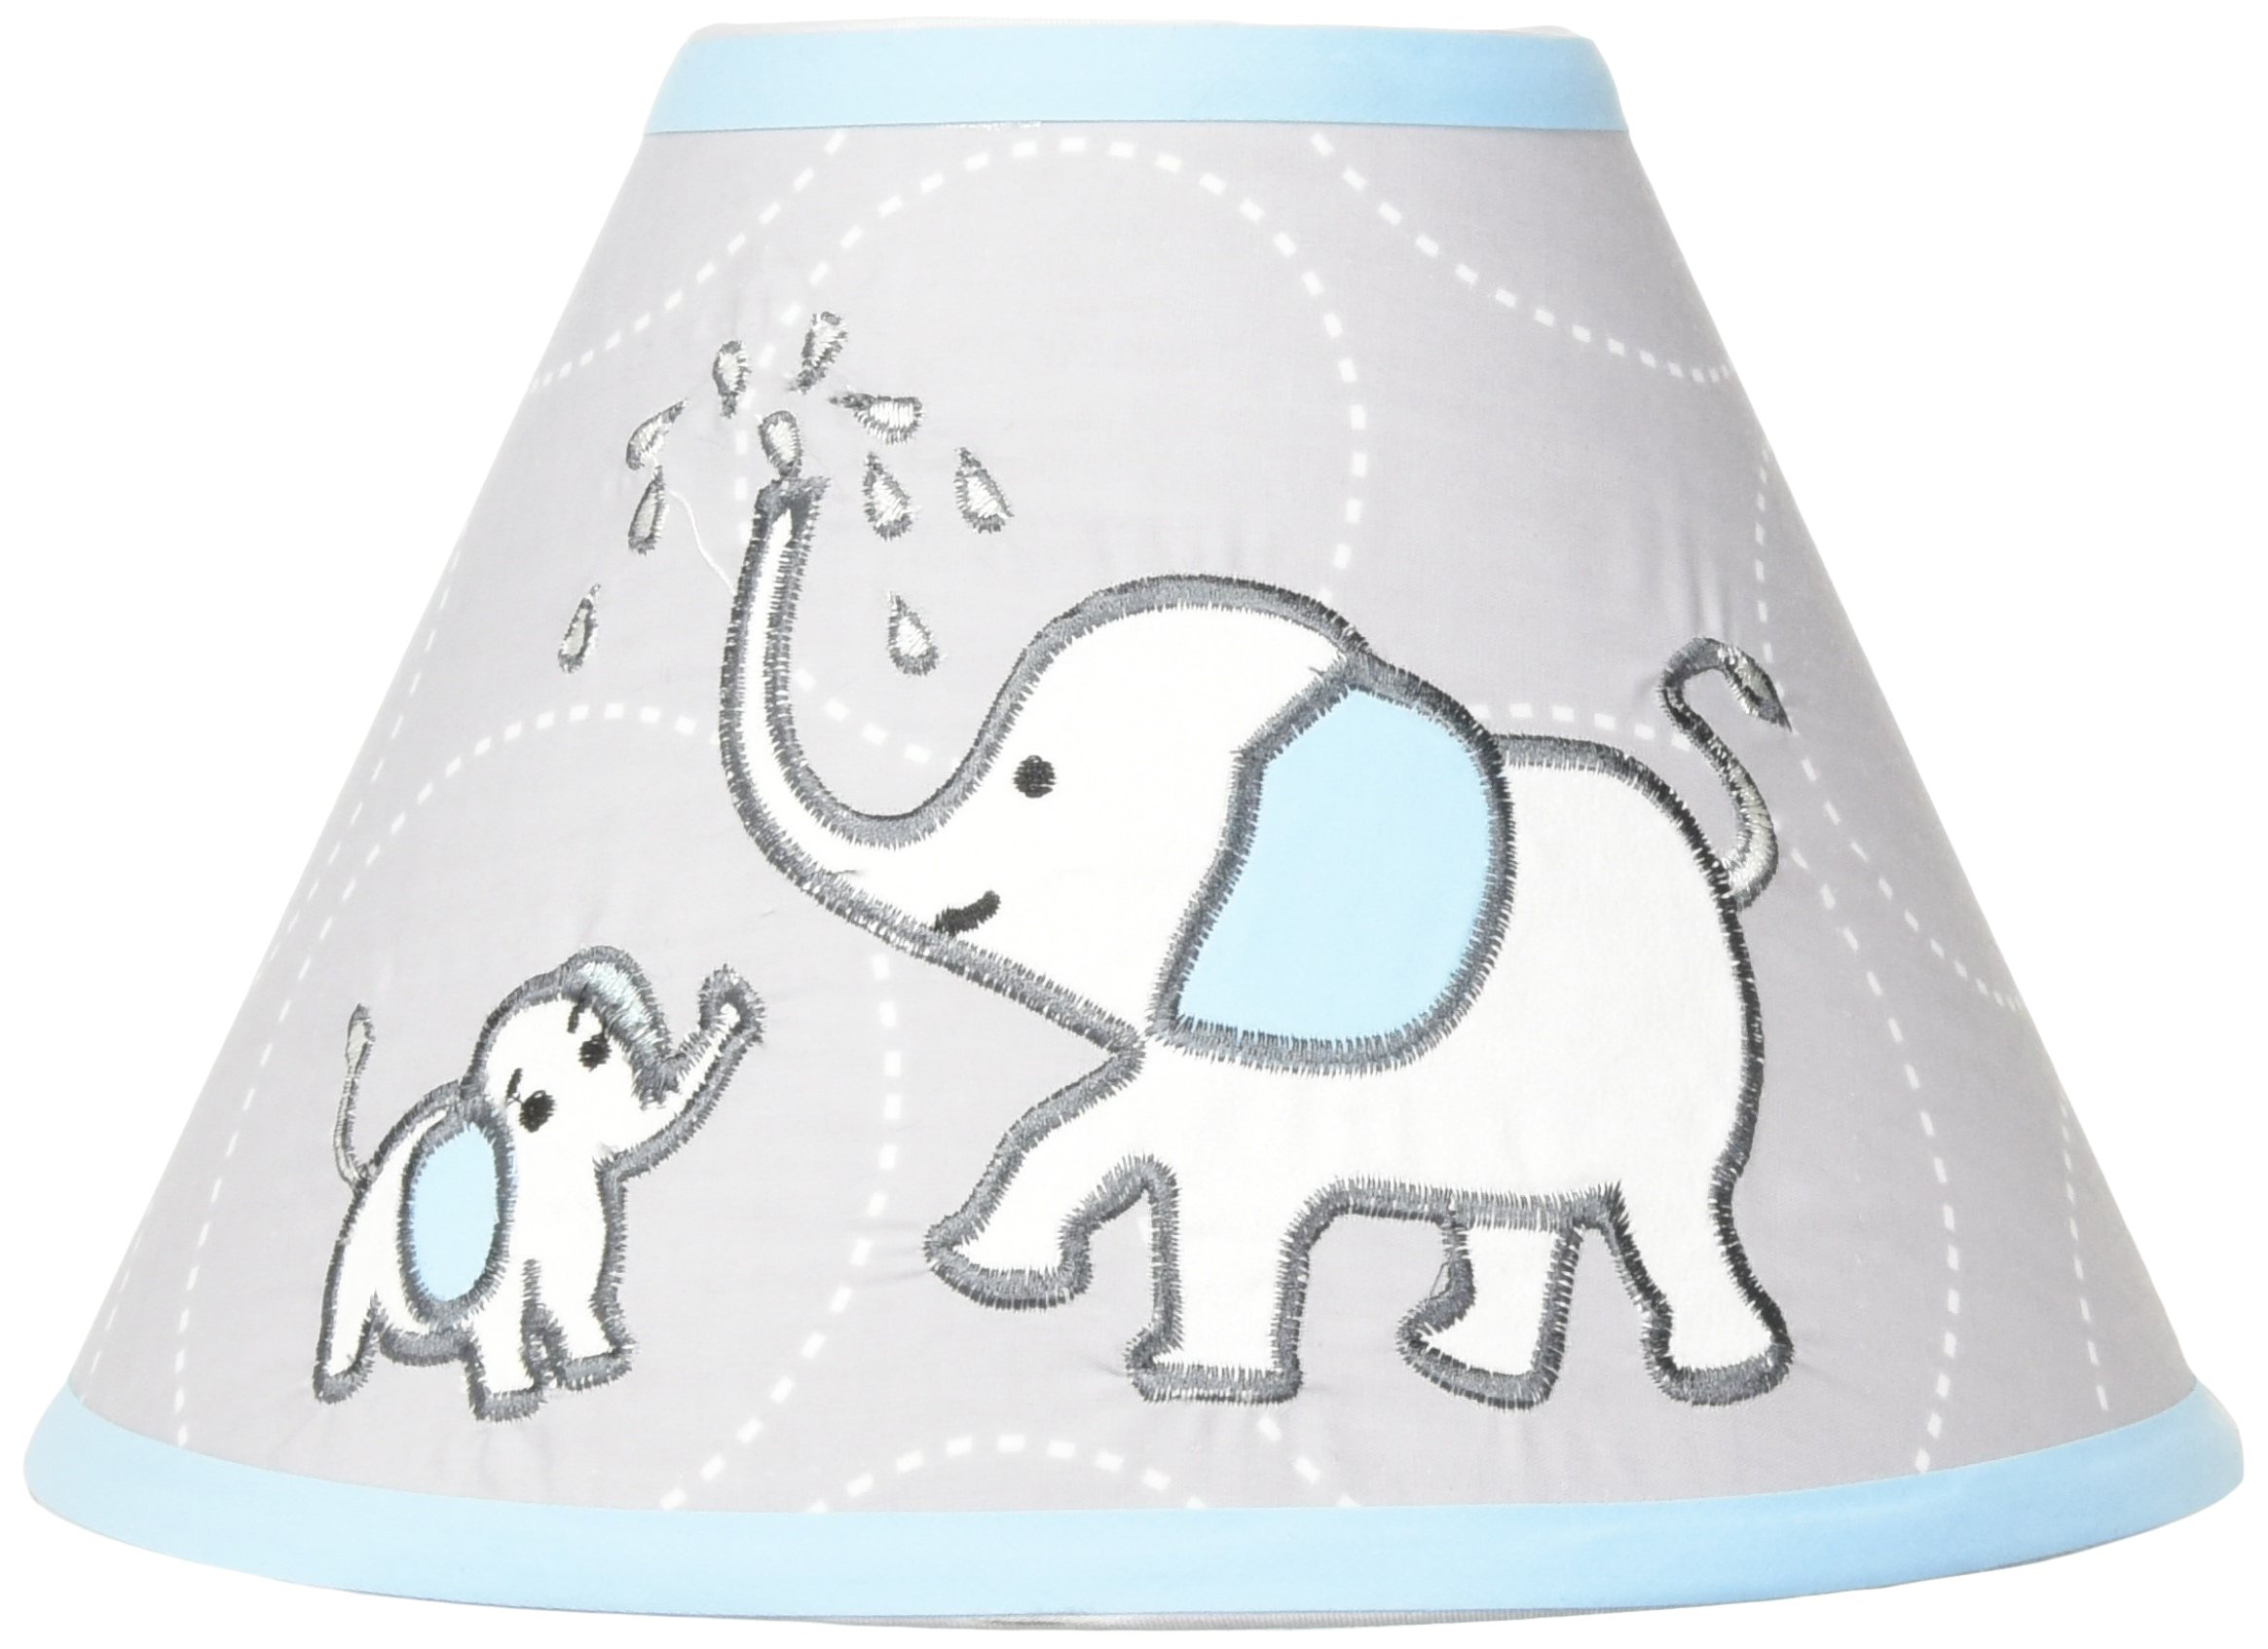 GEENNY Lamp Shade, Blizzard Blue Grey Elephant